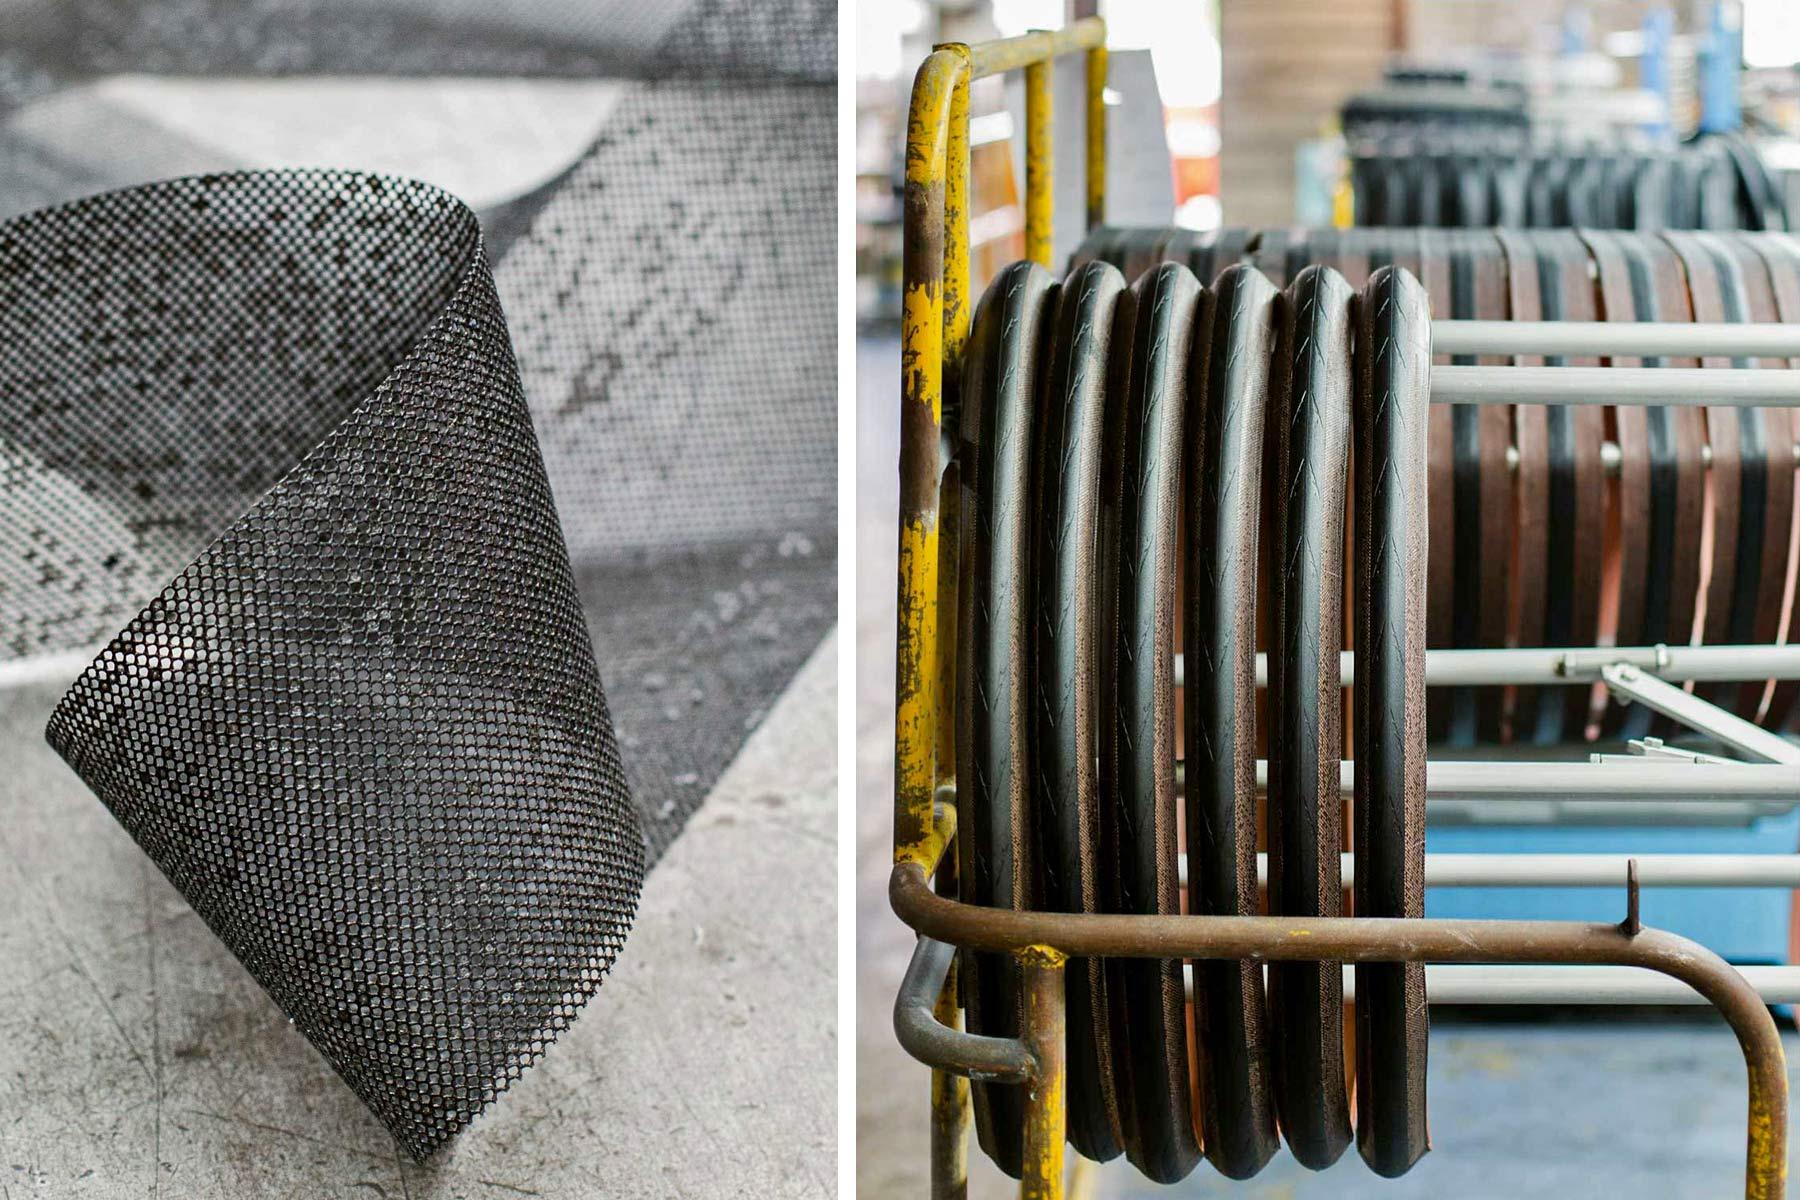 Hutchinson Gridskin lightweight reinforced sustainable gravel road bike tires,next options